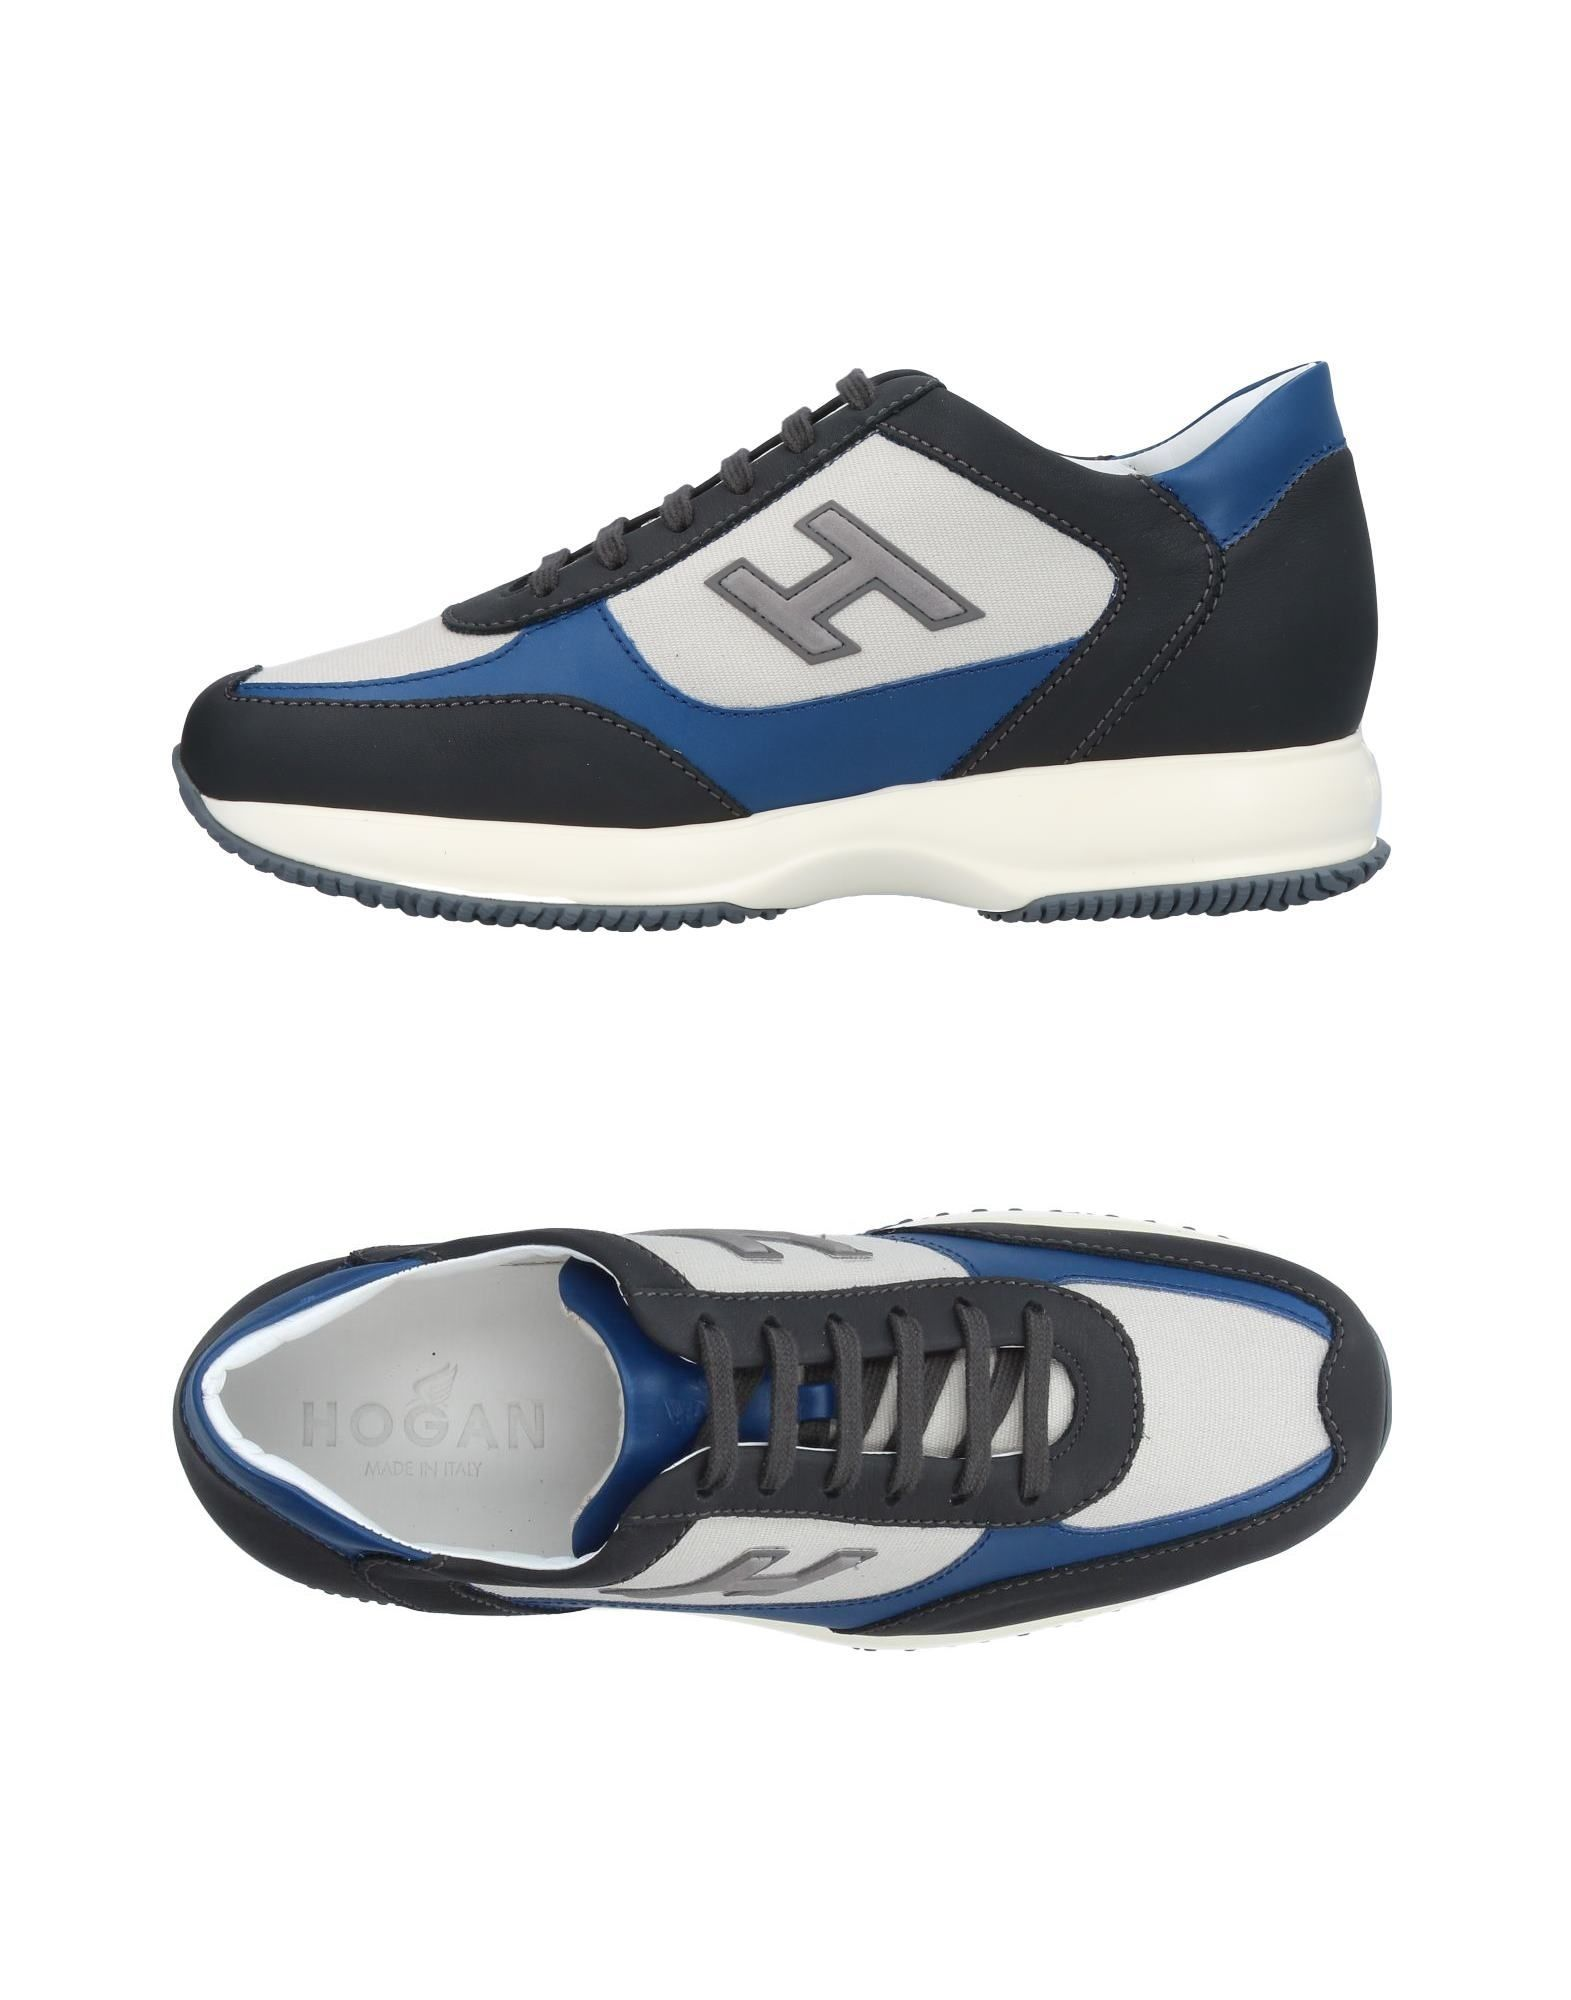 Hogan Sneakers Herren  11415172CL Gute Qualität beliebte Schuhe